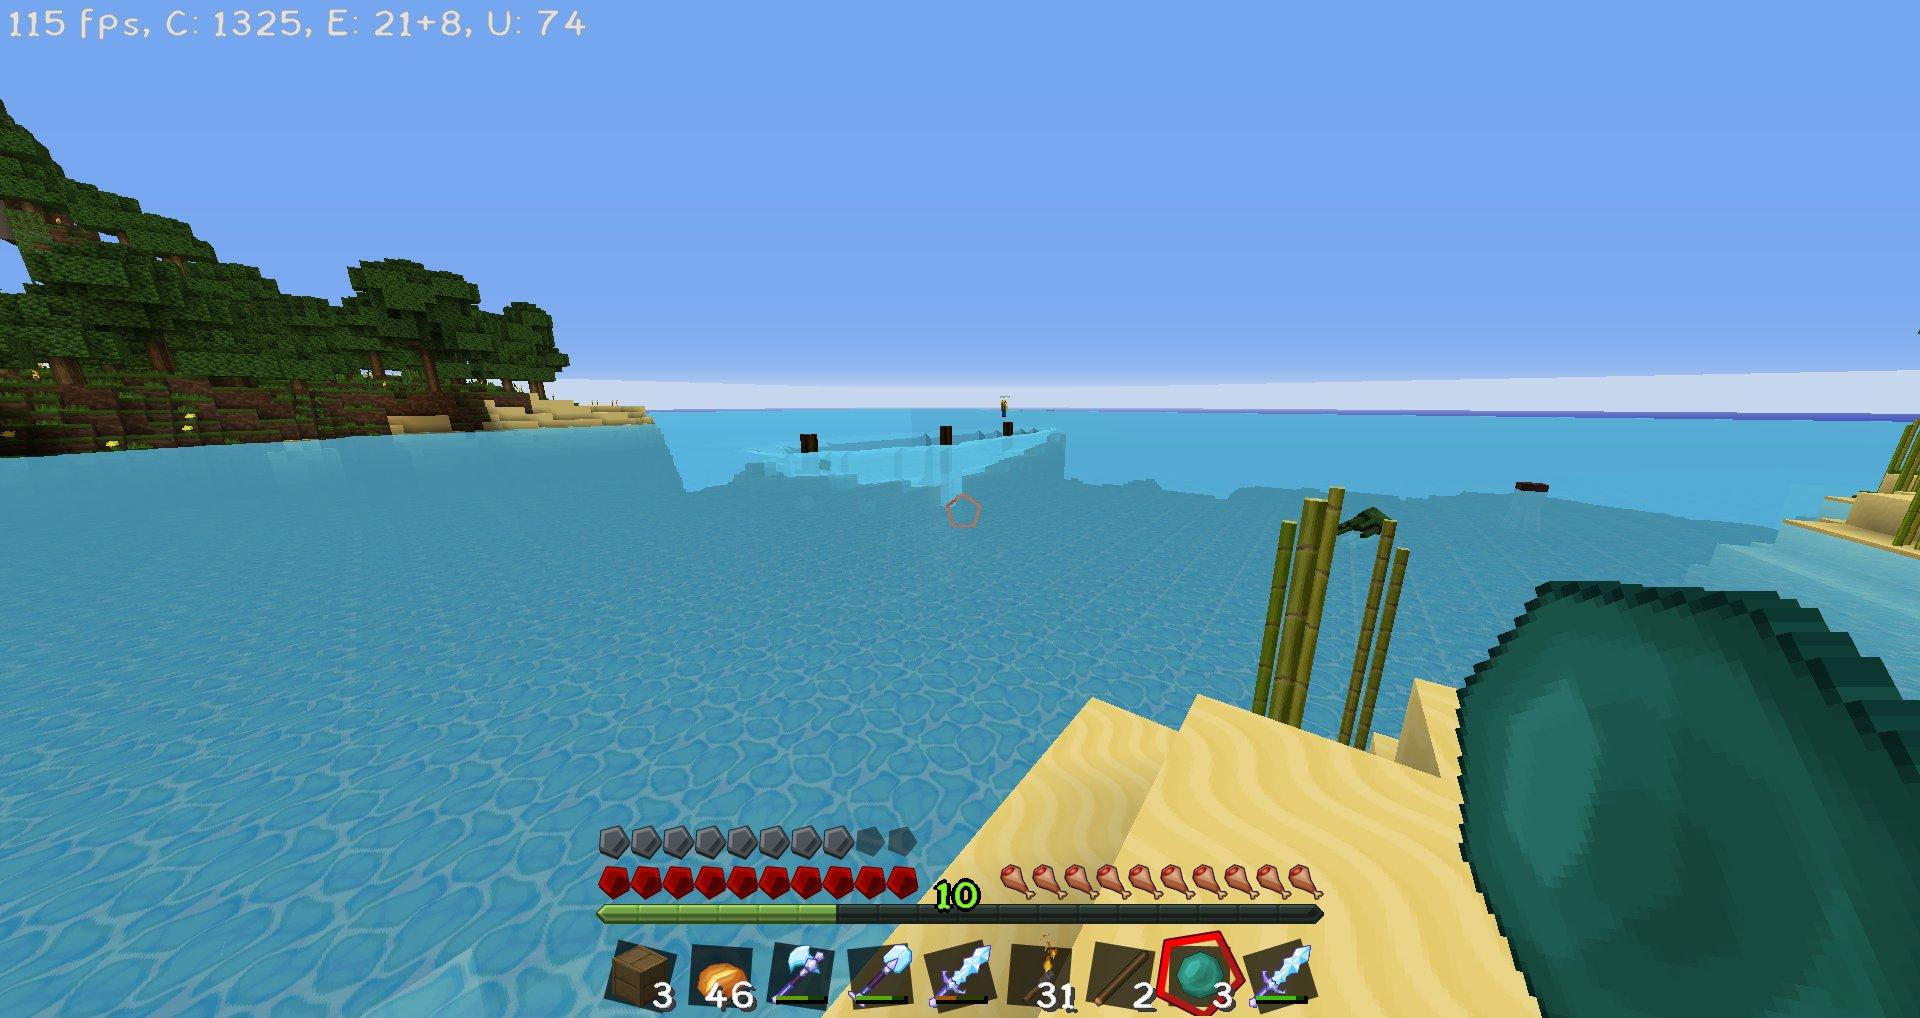 Great Inagua : La baie des pirates - Page 2 48da8426-9d51-4c1a-9099-6ad4fd9739d7